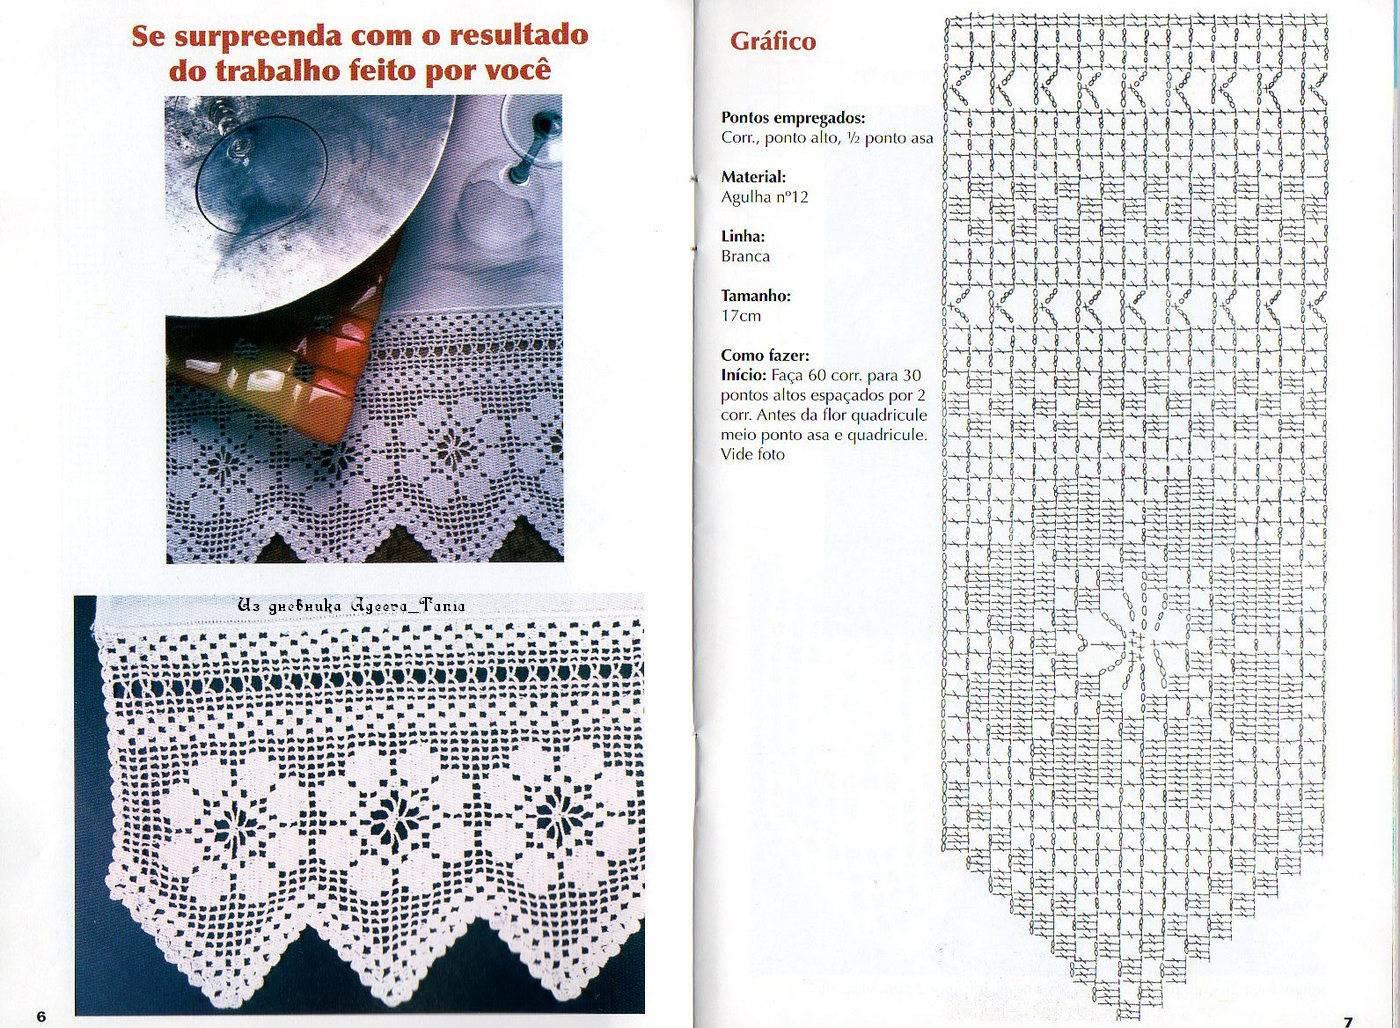 Crochet knitting handicraft many edges filet for Cortinas de gancho para cocina